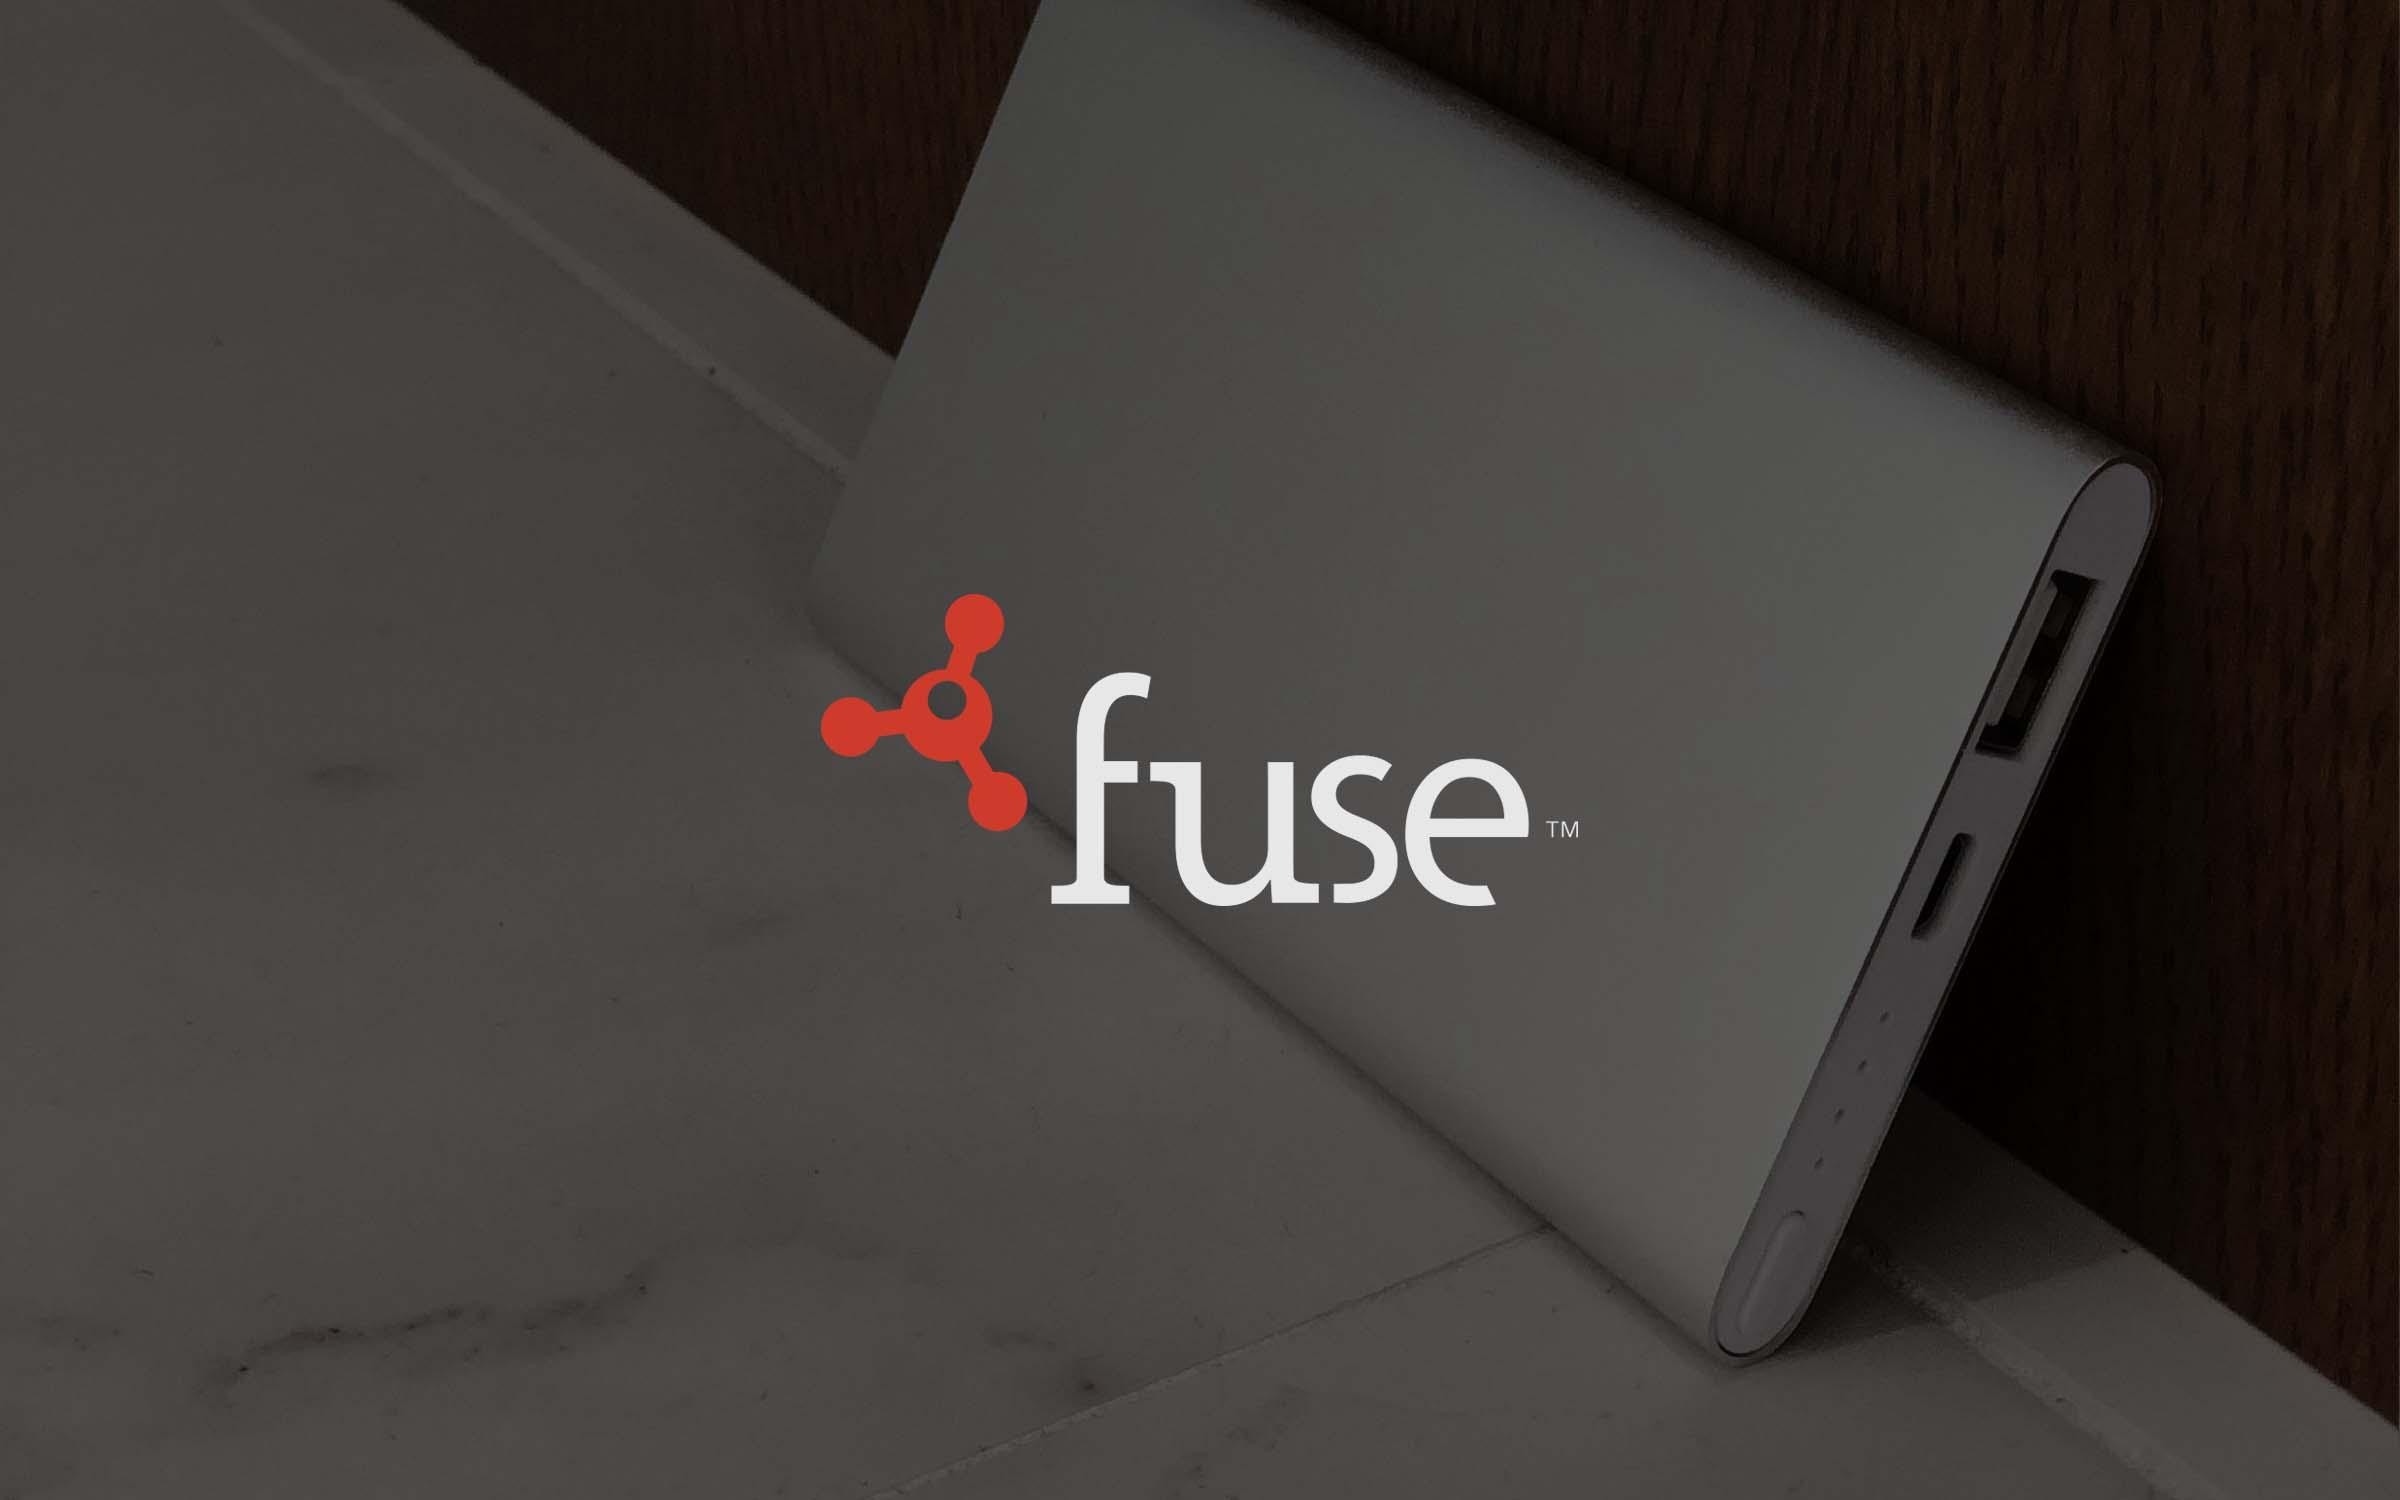 top brand intro blocks_Fuse_02.jpg